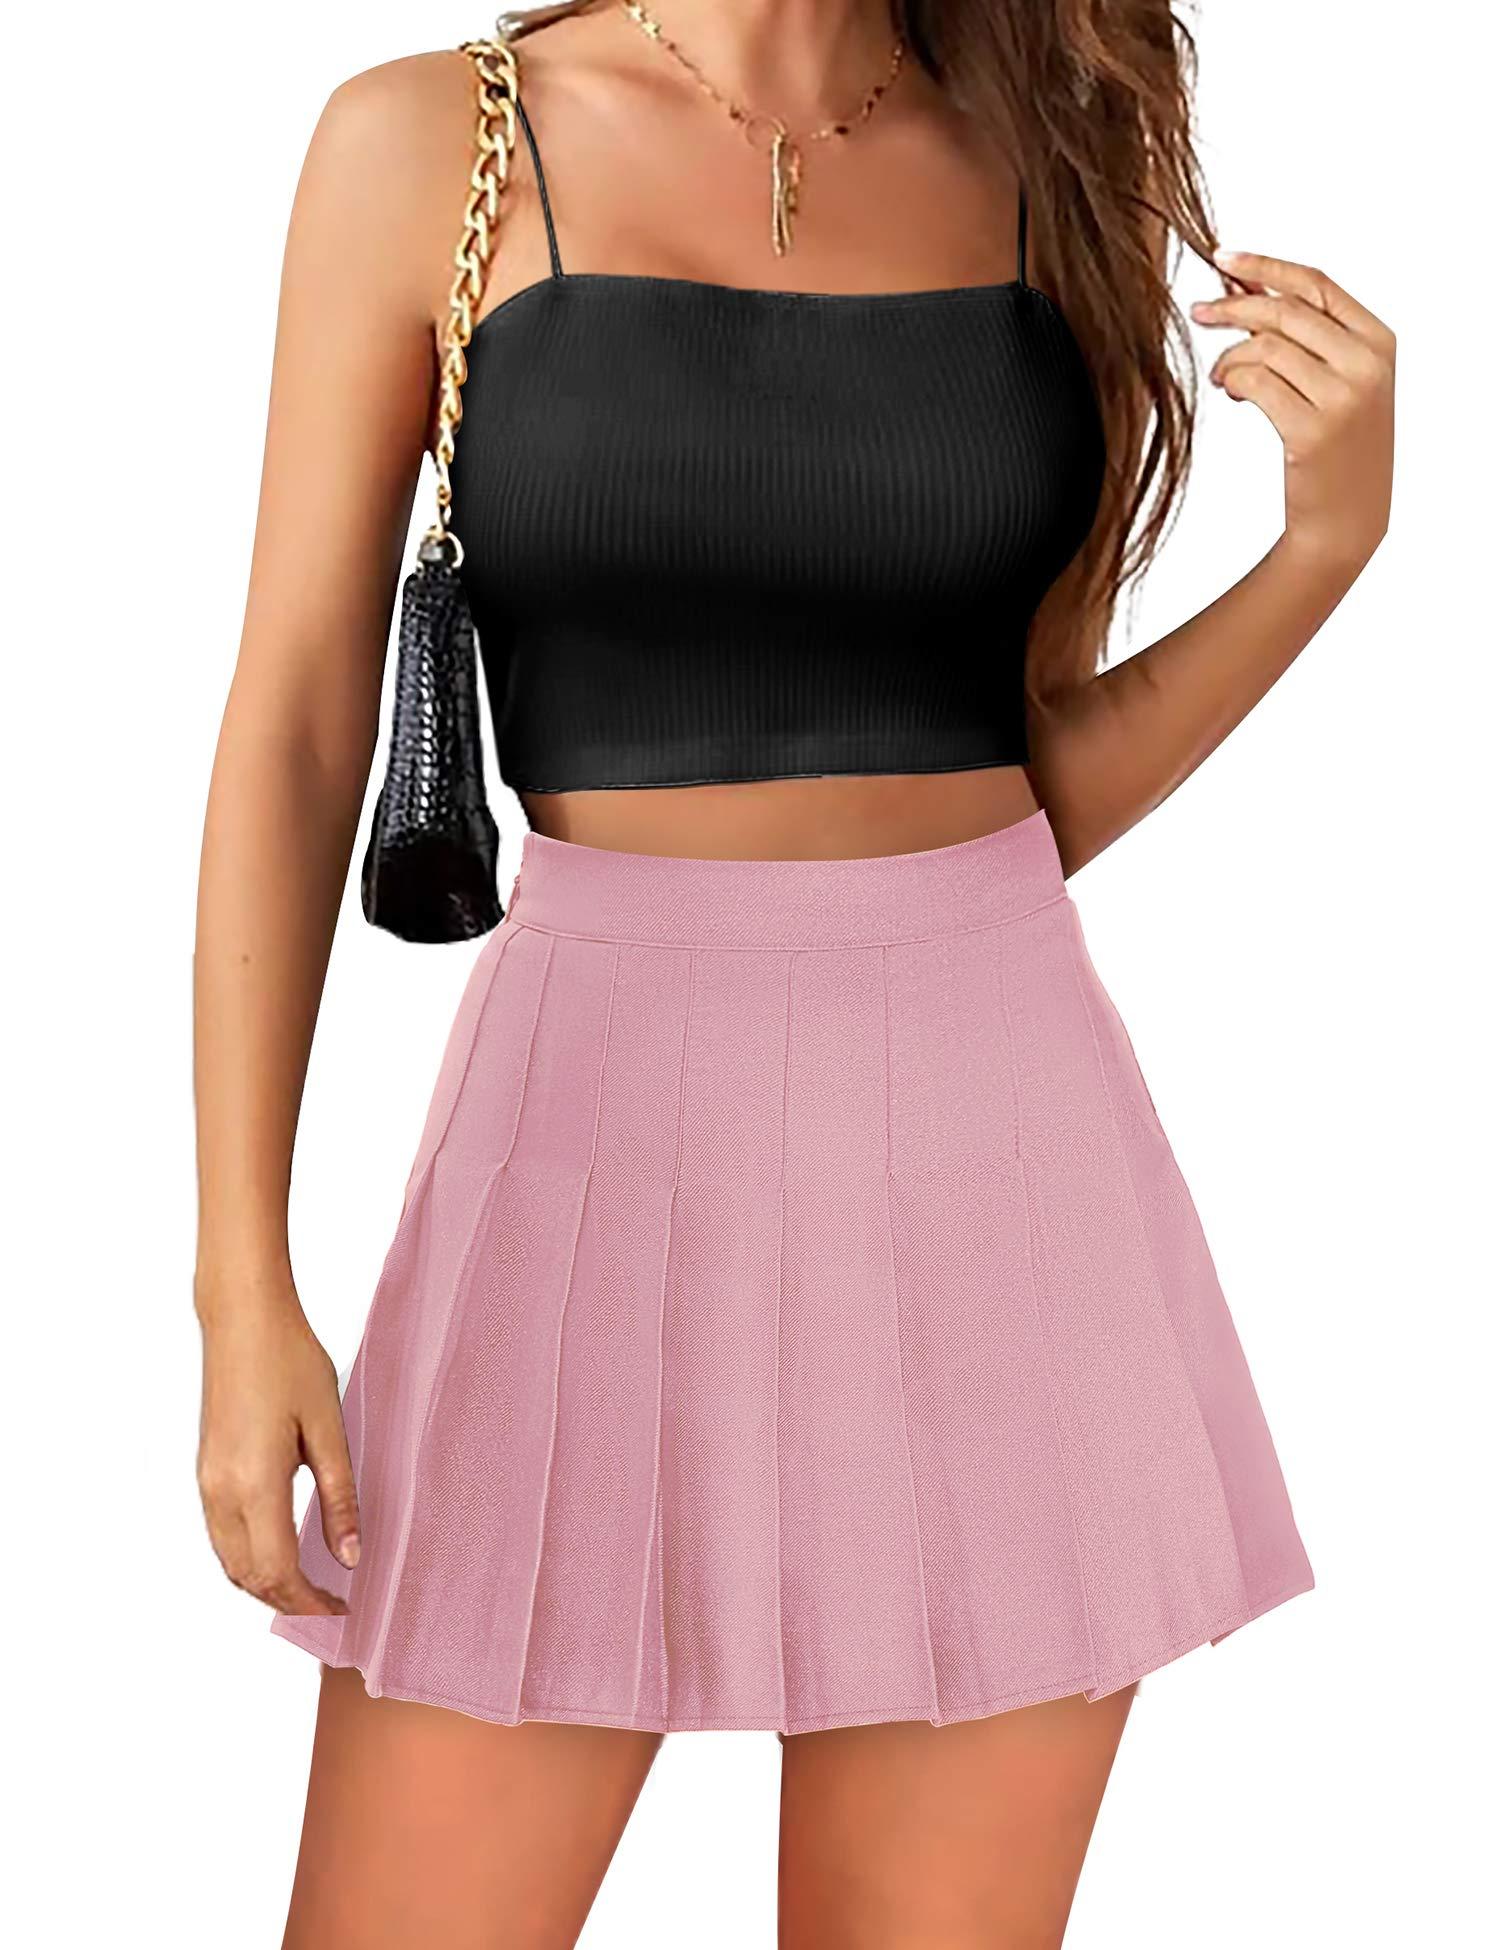 Womens Mini Pleated Skirt High Waisted Skater Tennis Skirts Skorts with Shorts School Girl Uniform